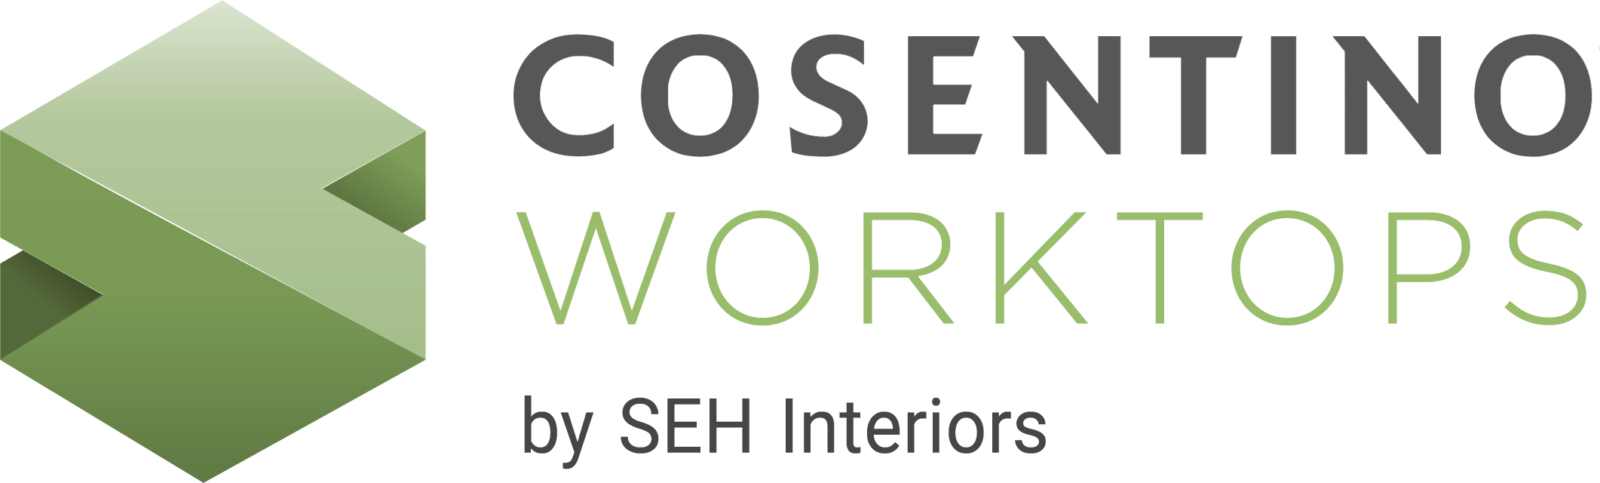 Cosentino Worktops by SEH Interiors